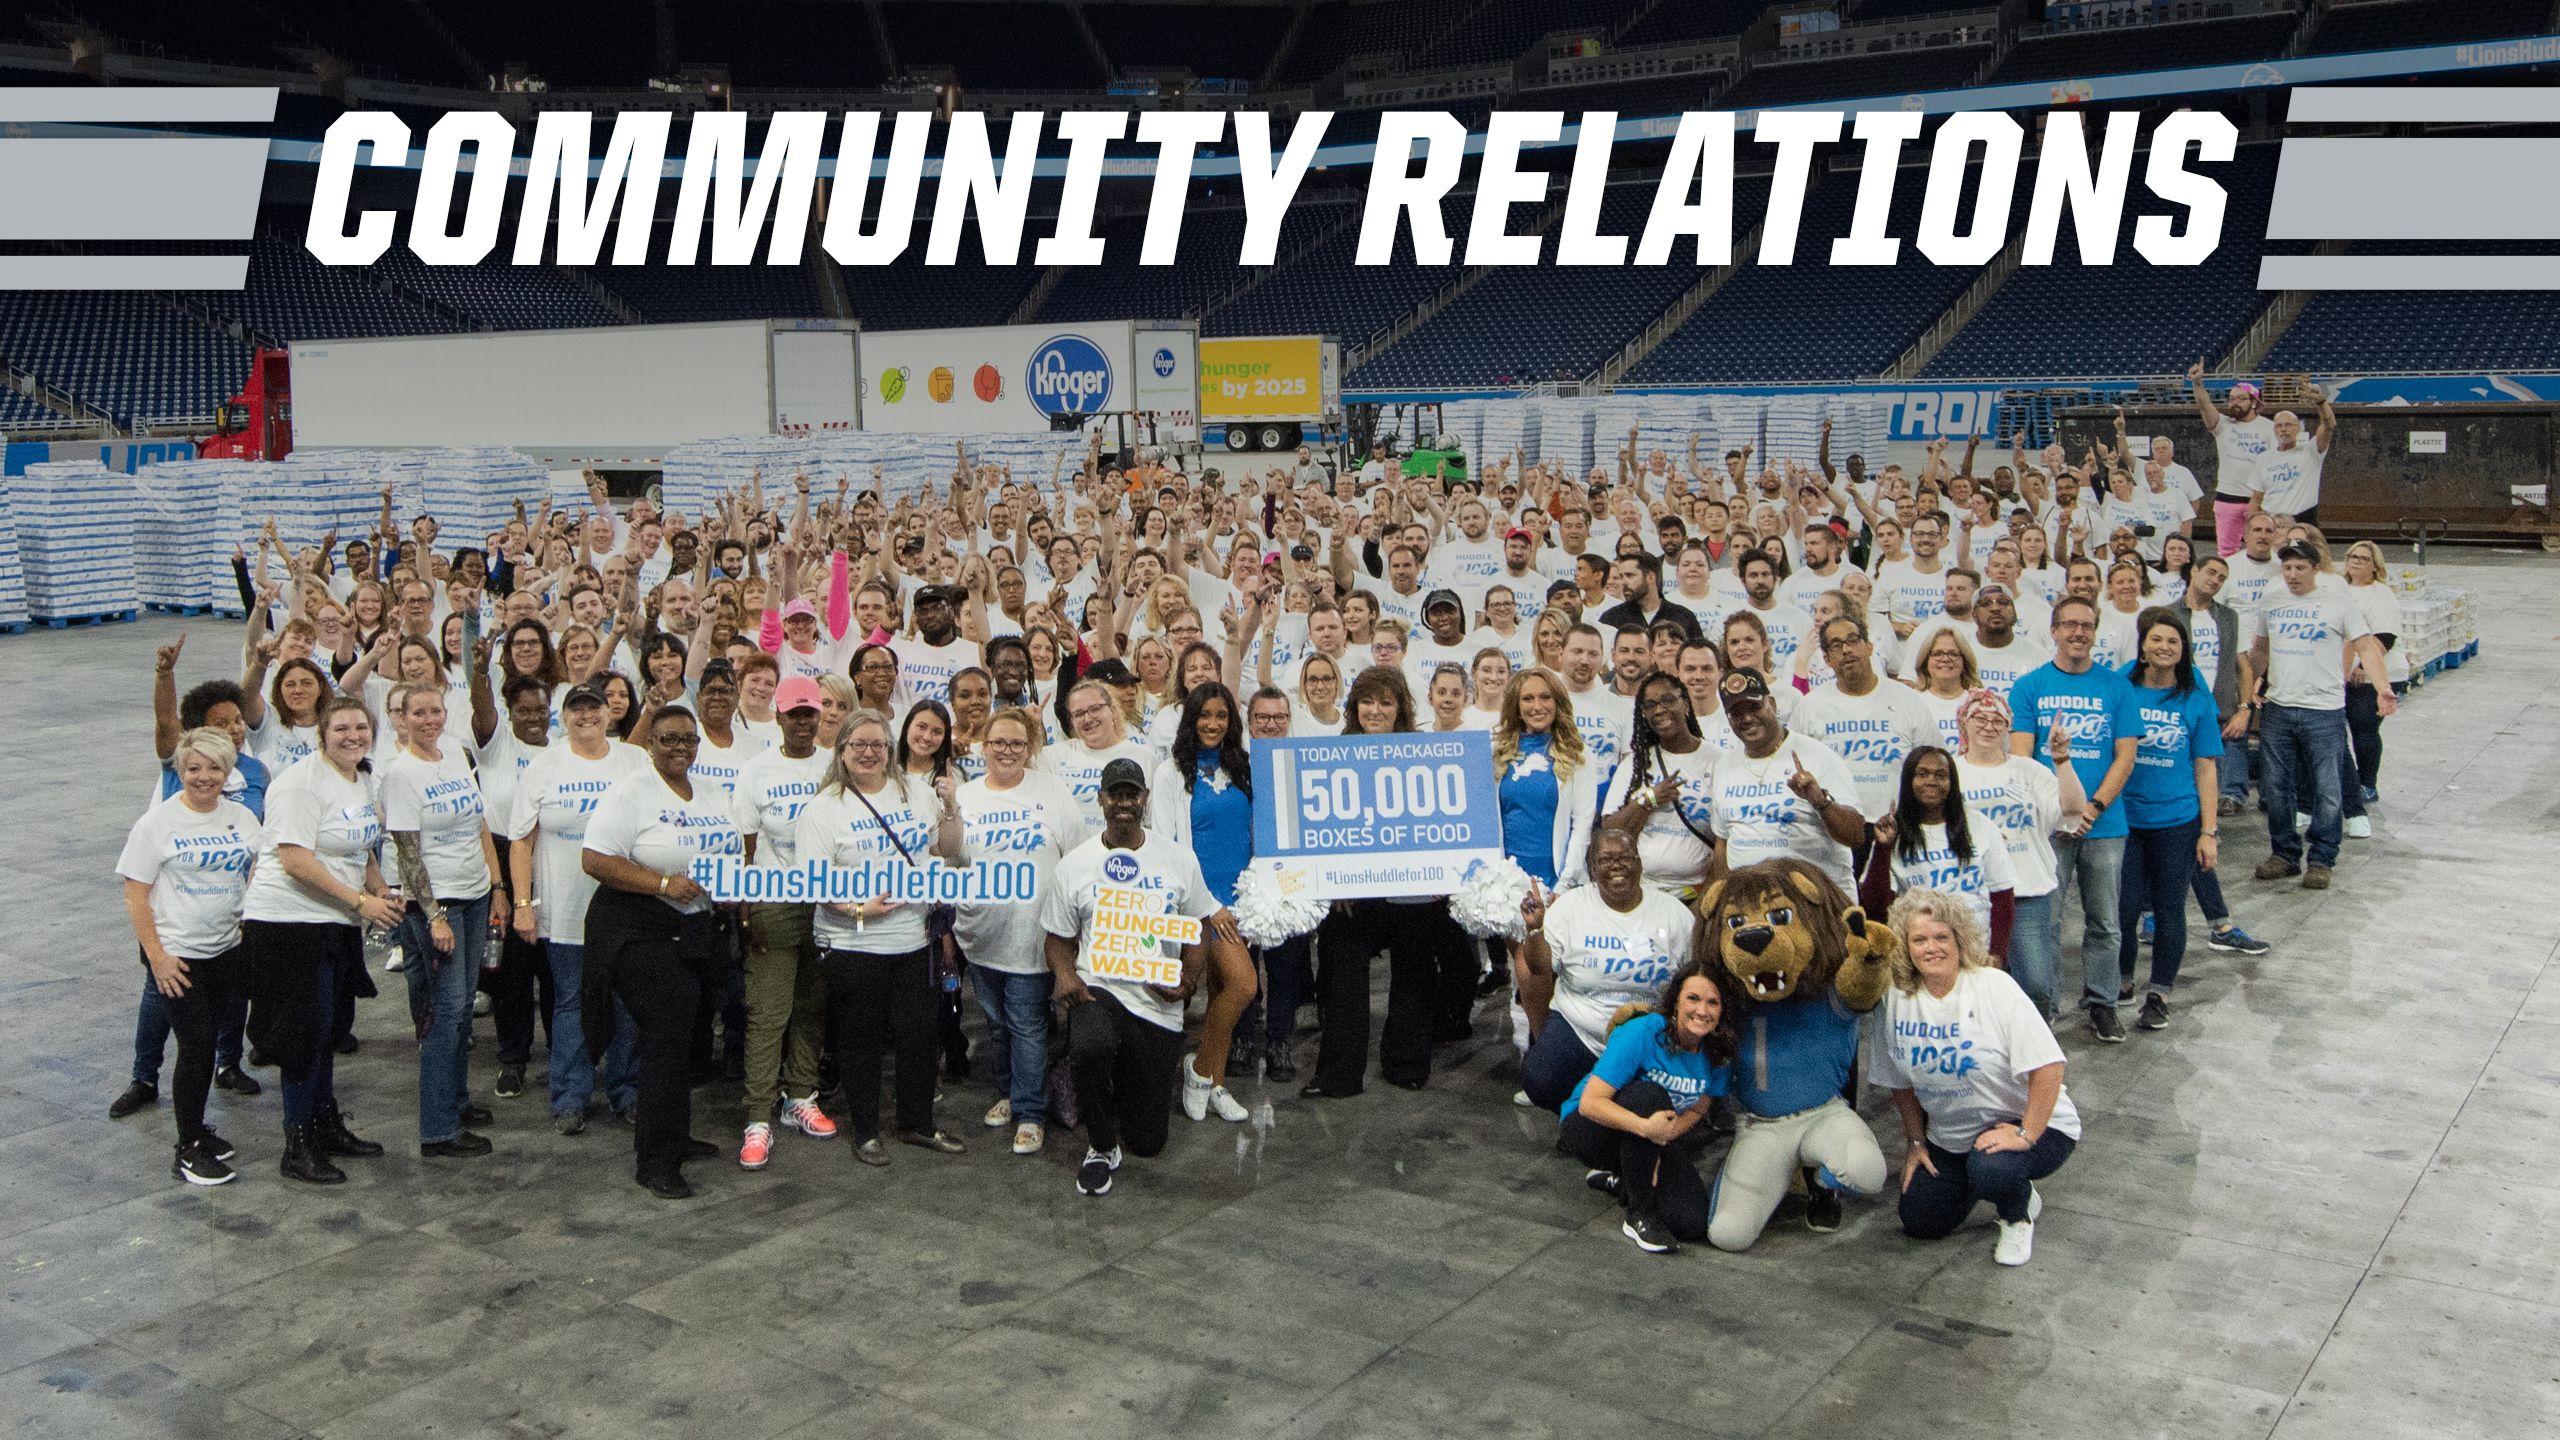 community-relations-main-top-banner-053118